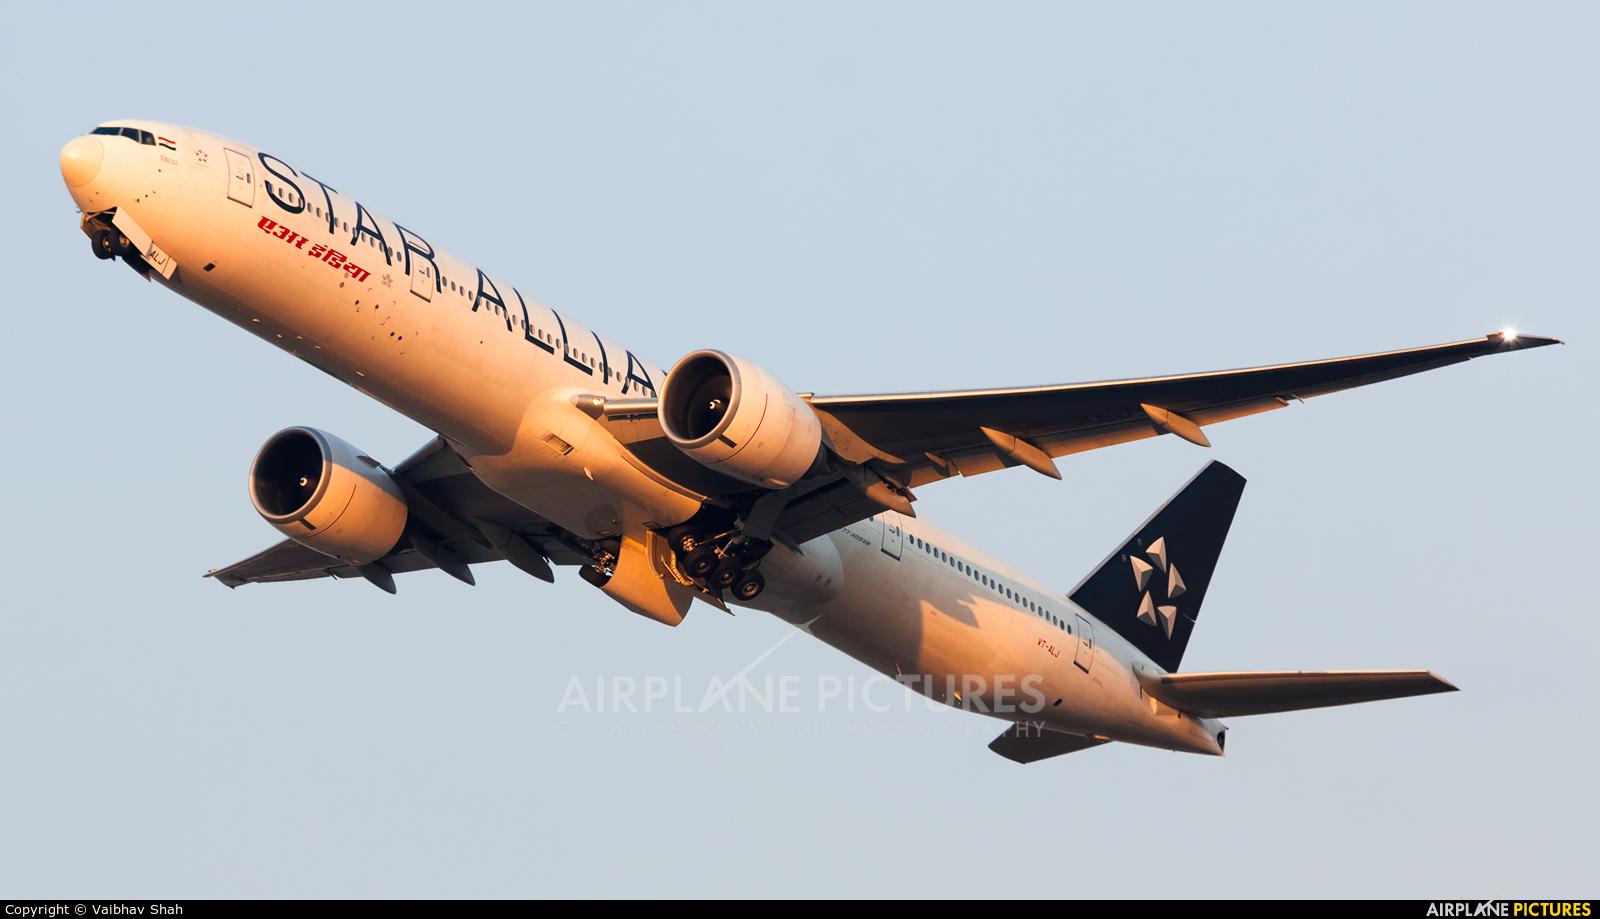 Air India VT-ALJ aircraft at Mumbai - Chhatrapati Shivaji Intl